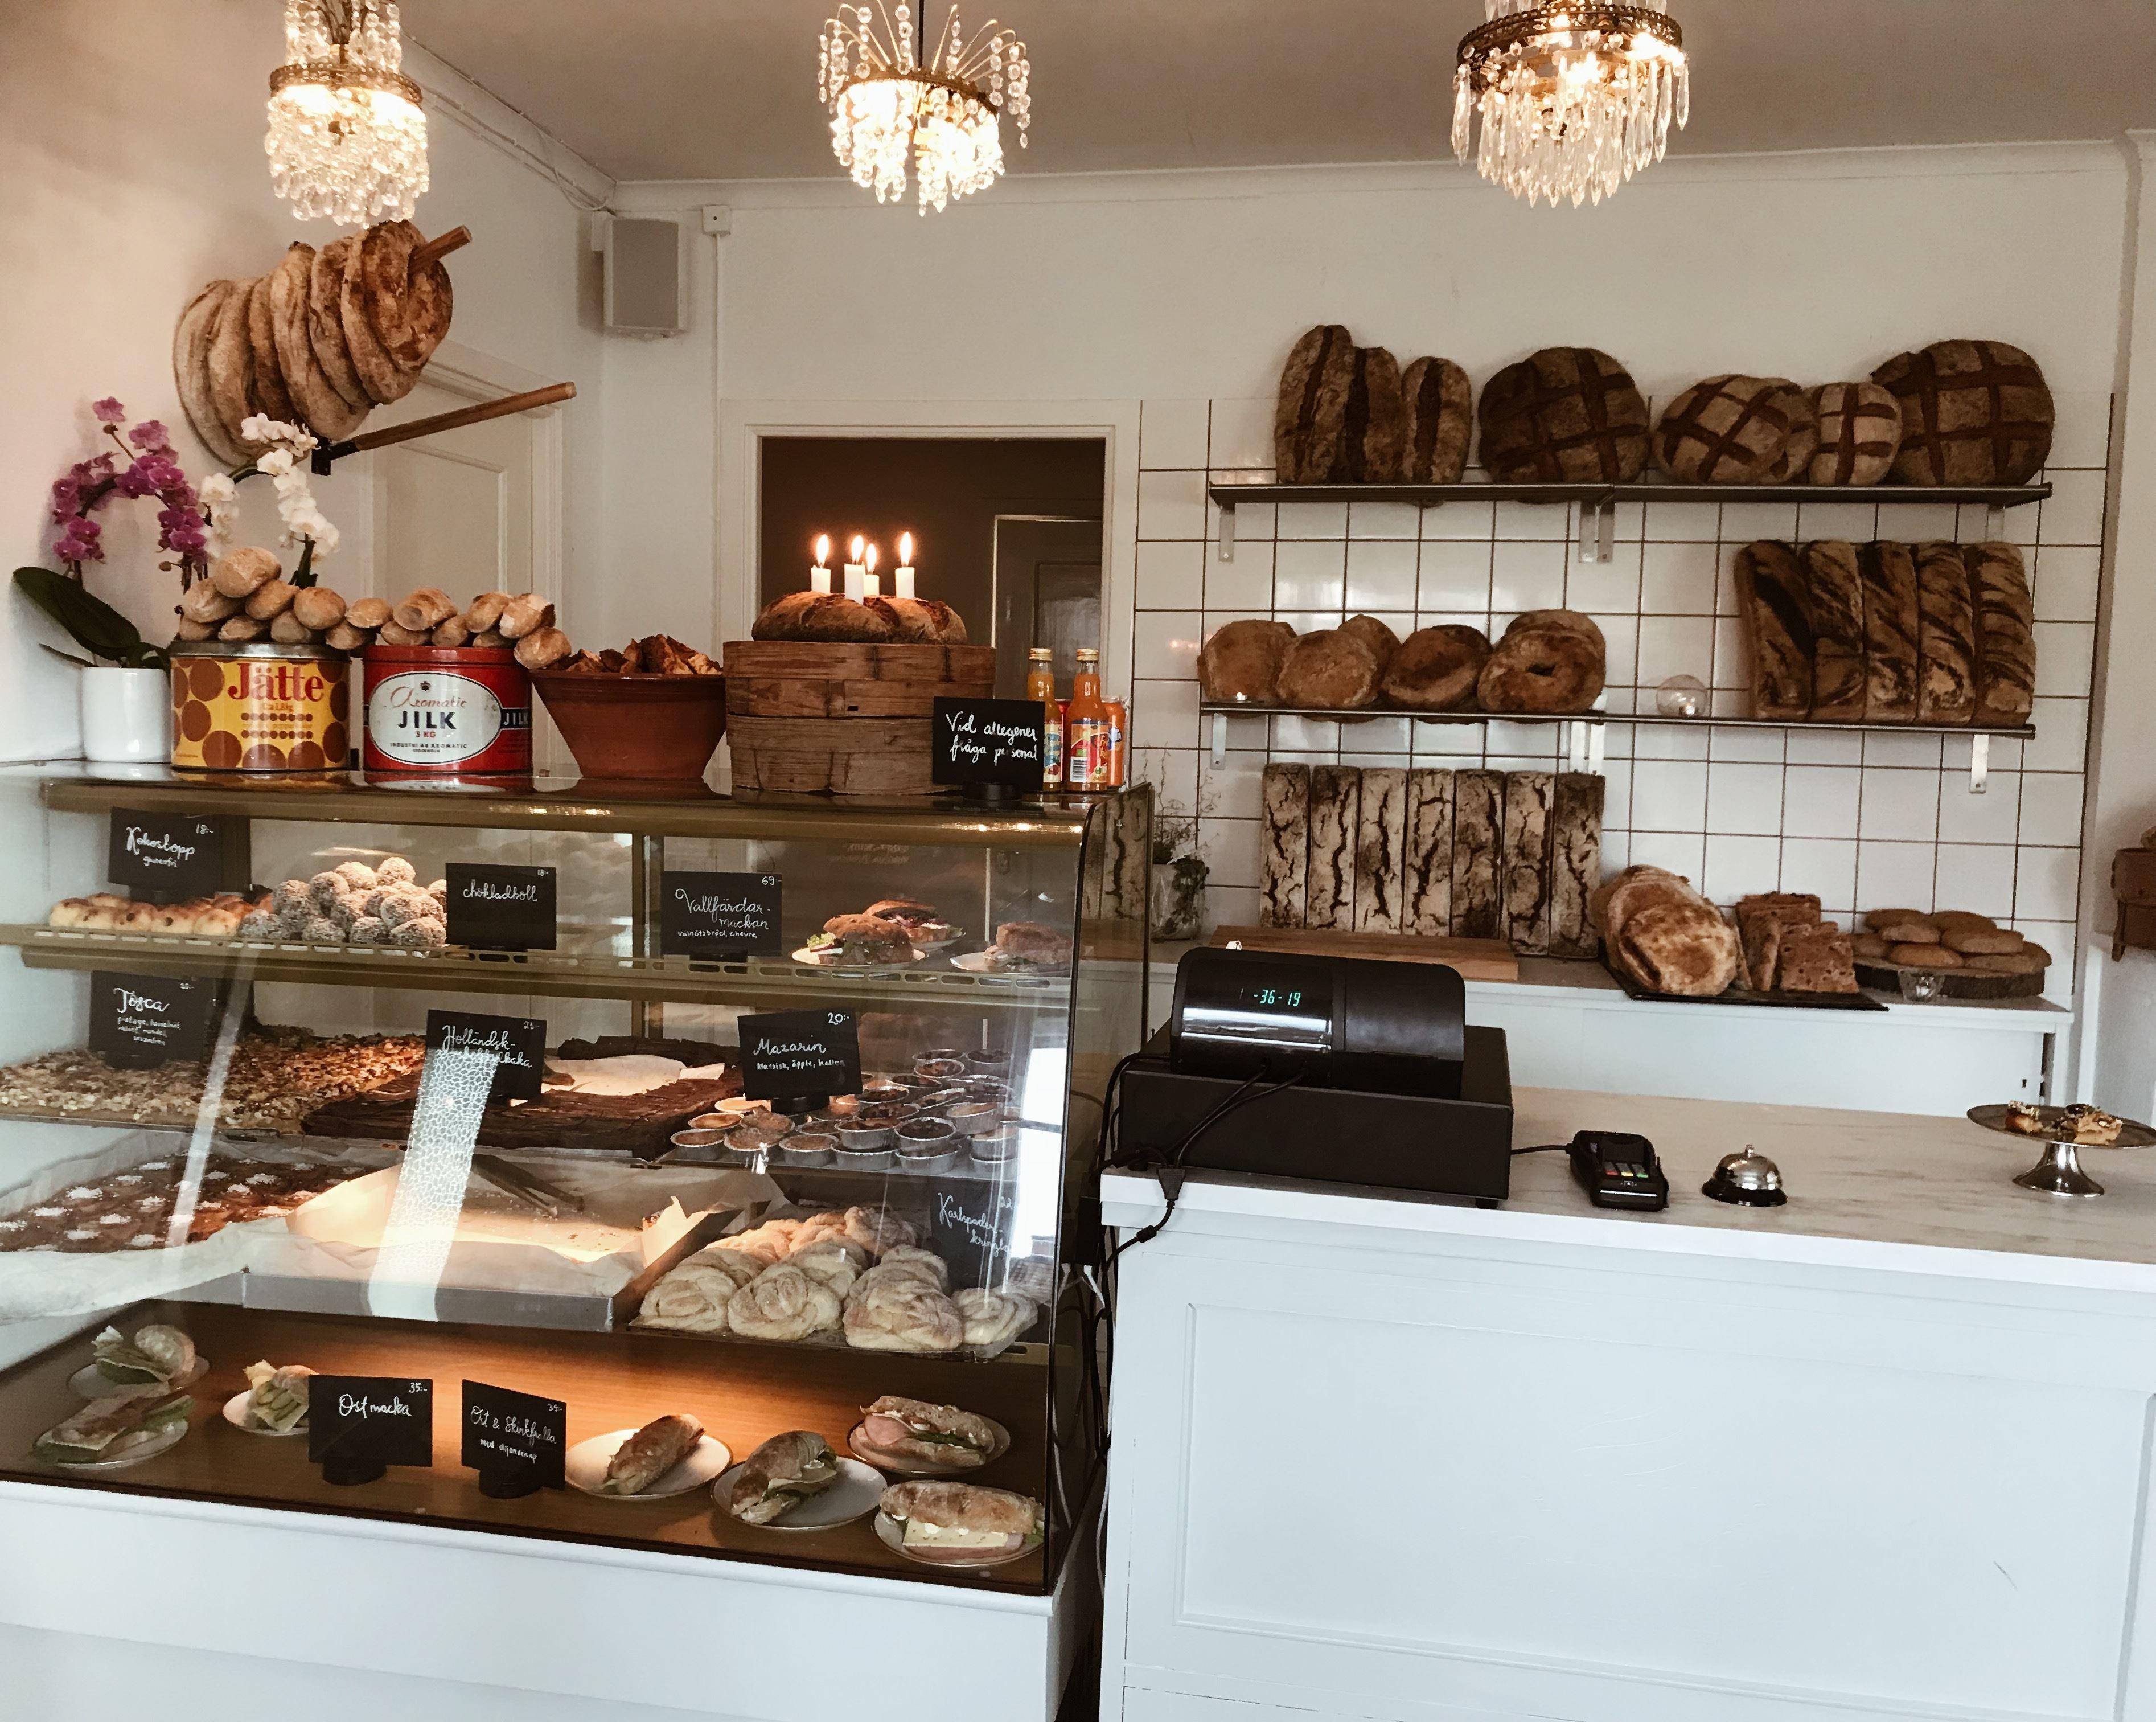 HeddaGretas Café & Stenugnsbageri